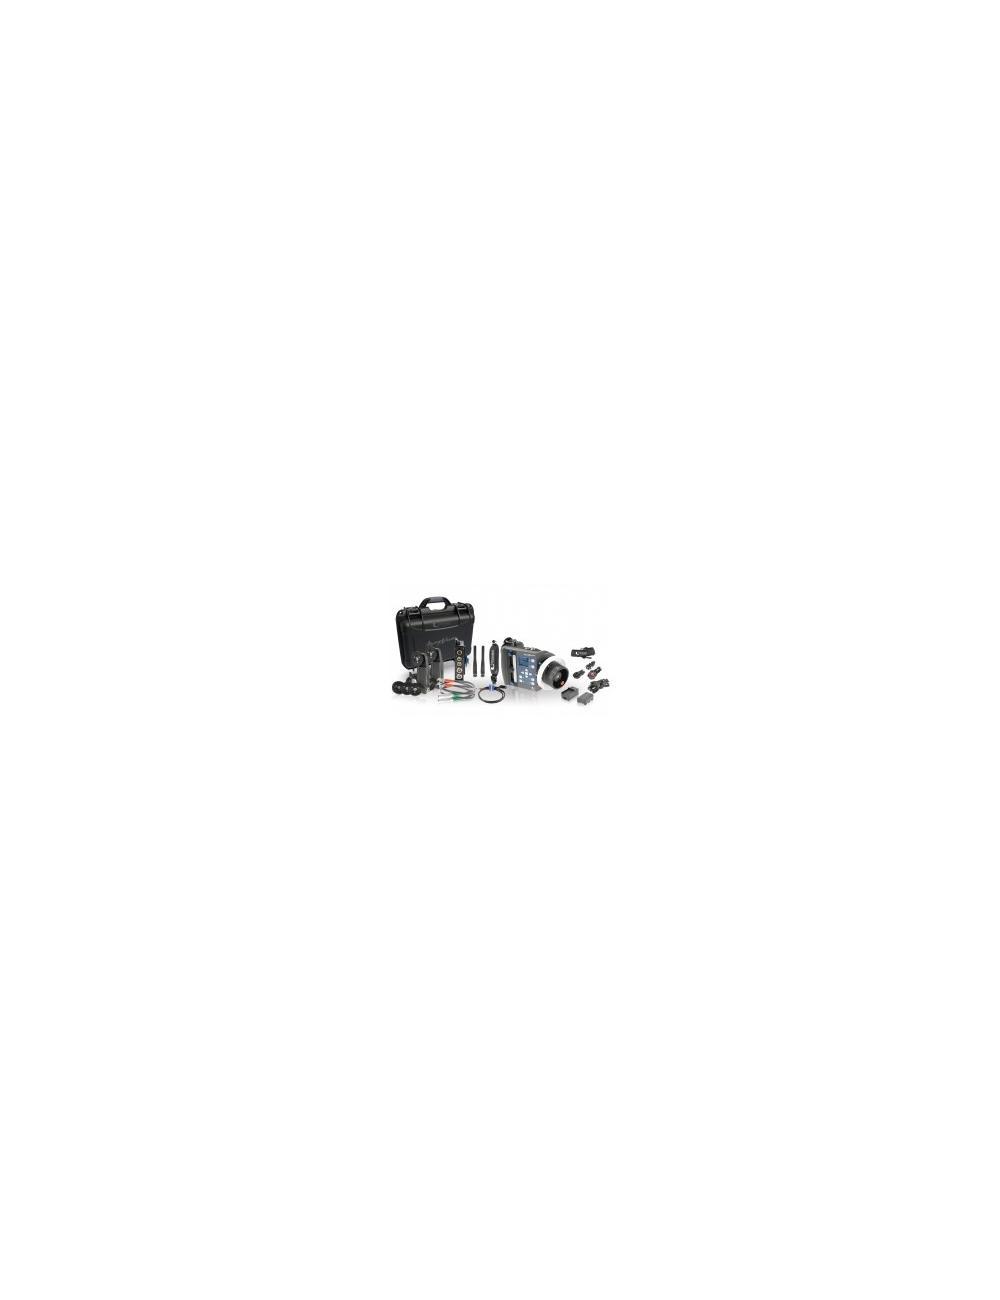 Chrosziel - Control inalámbrico MagNum (motor Hedén) foco/iris/cámara MN200KITH